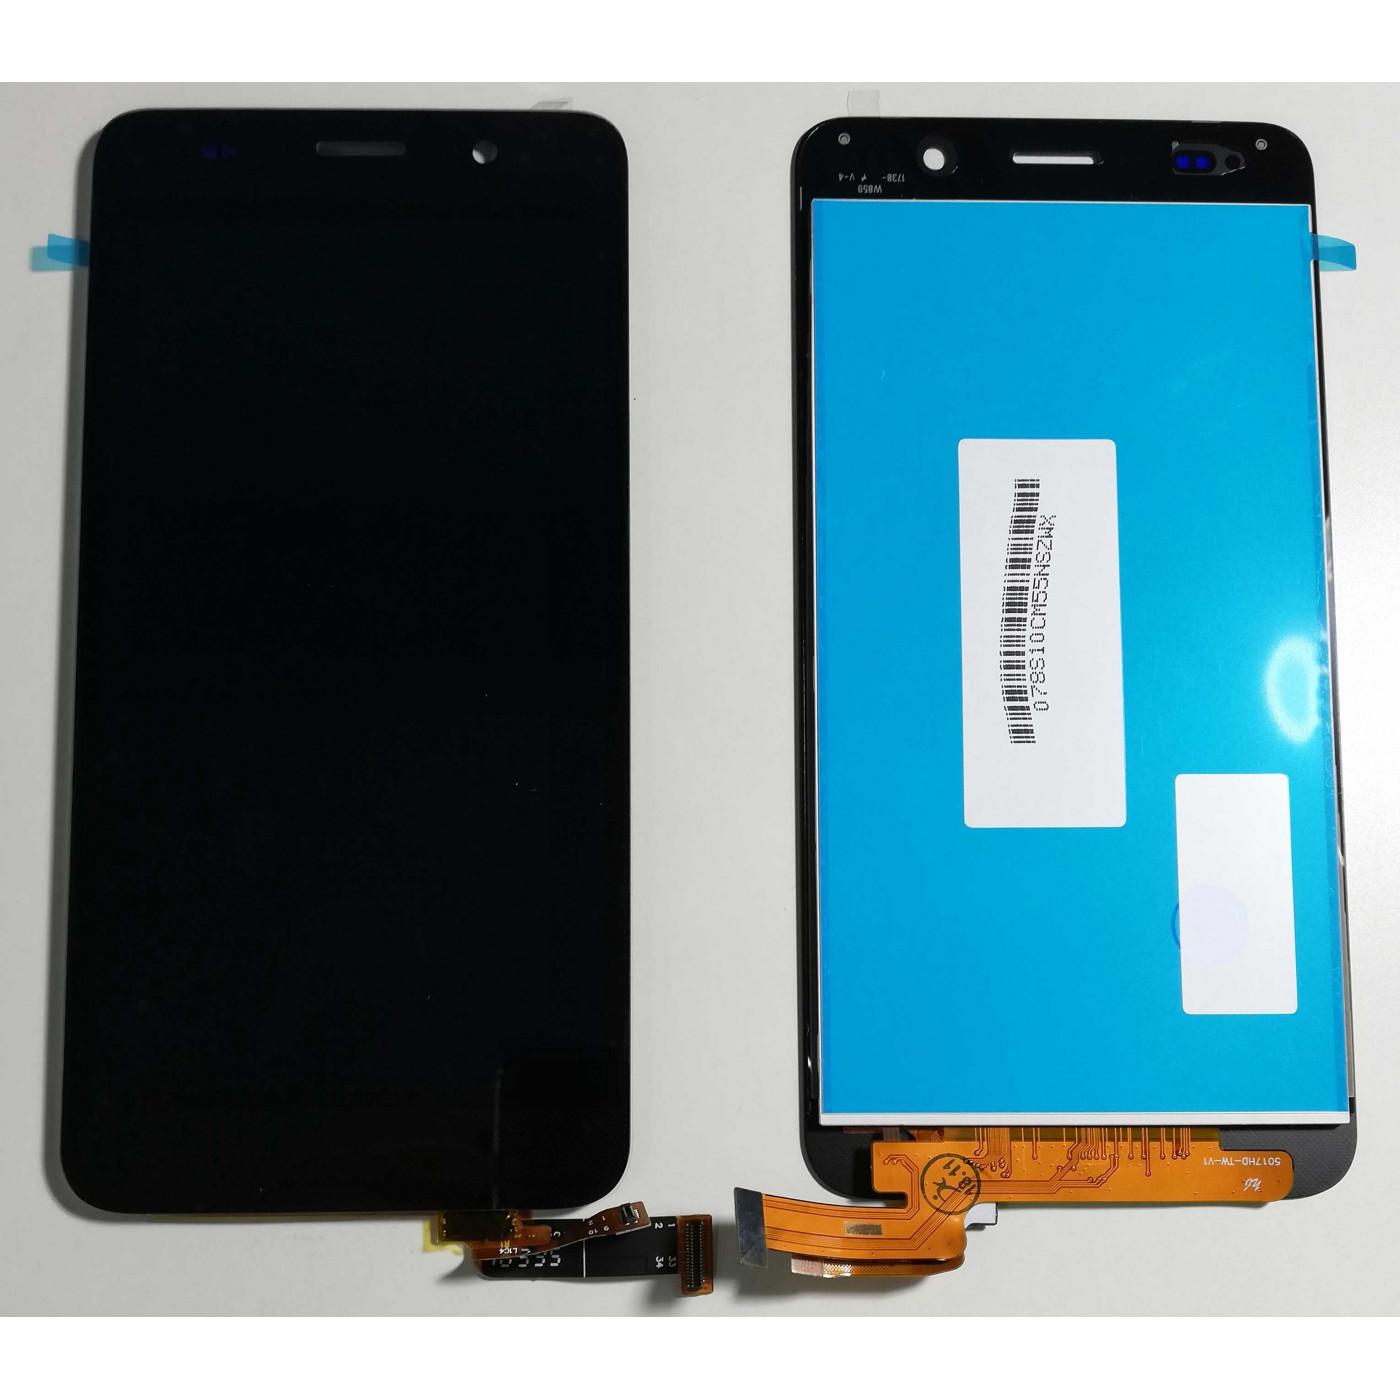 PANTALLA TÁCTIL DE VIDRIO + Pantalla LCD para ASSEMBLED Negro Huawei Ascend SCL-L01